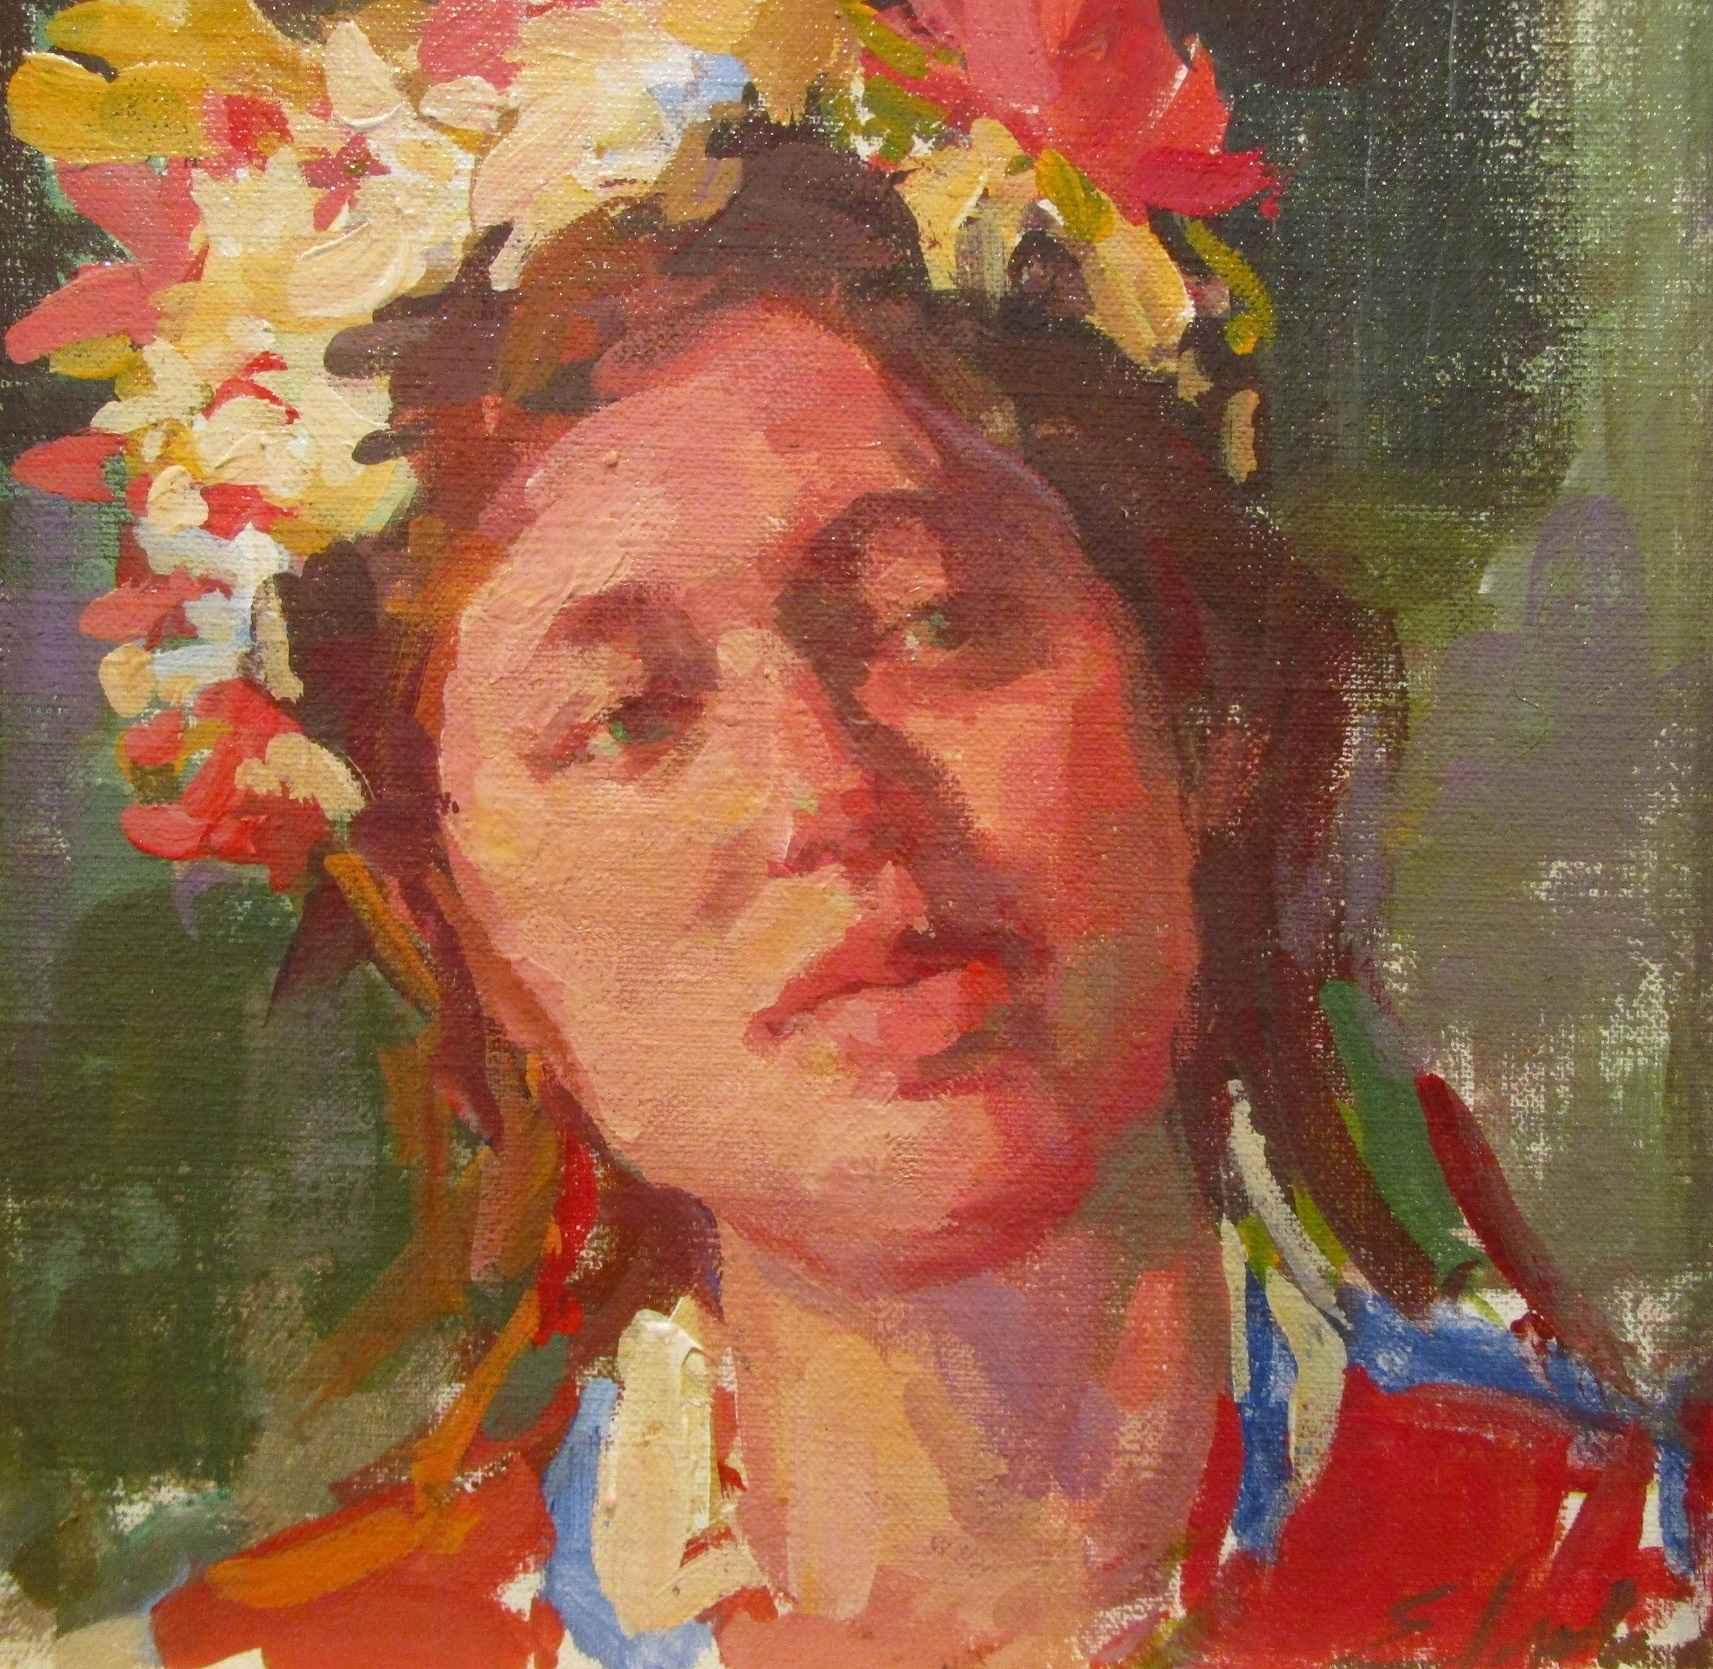 Flower Girl by  Melinda Morrison - Masterpiece Online